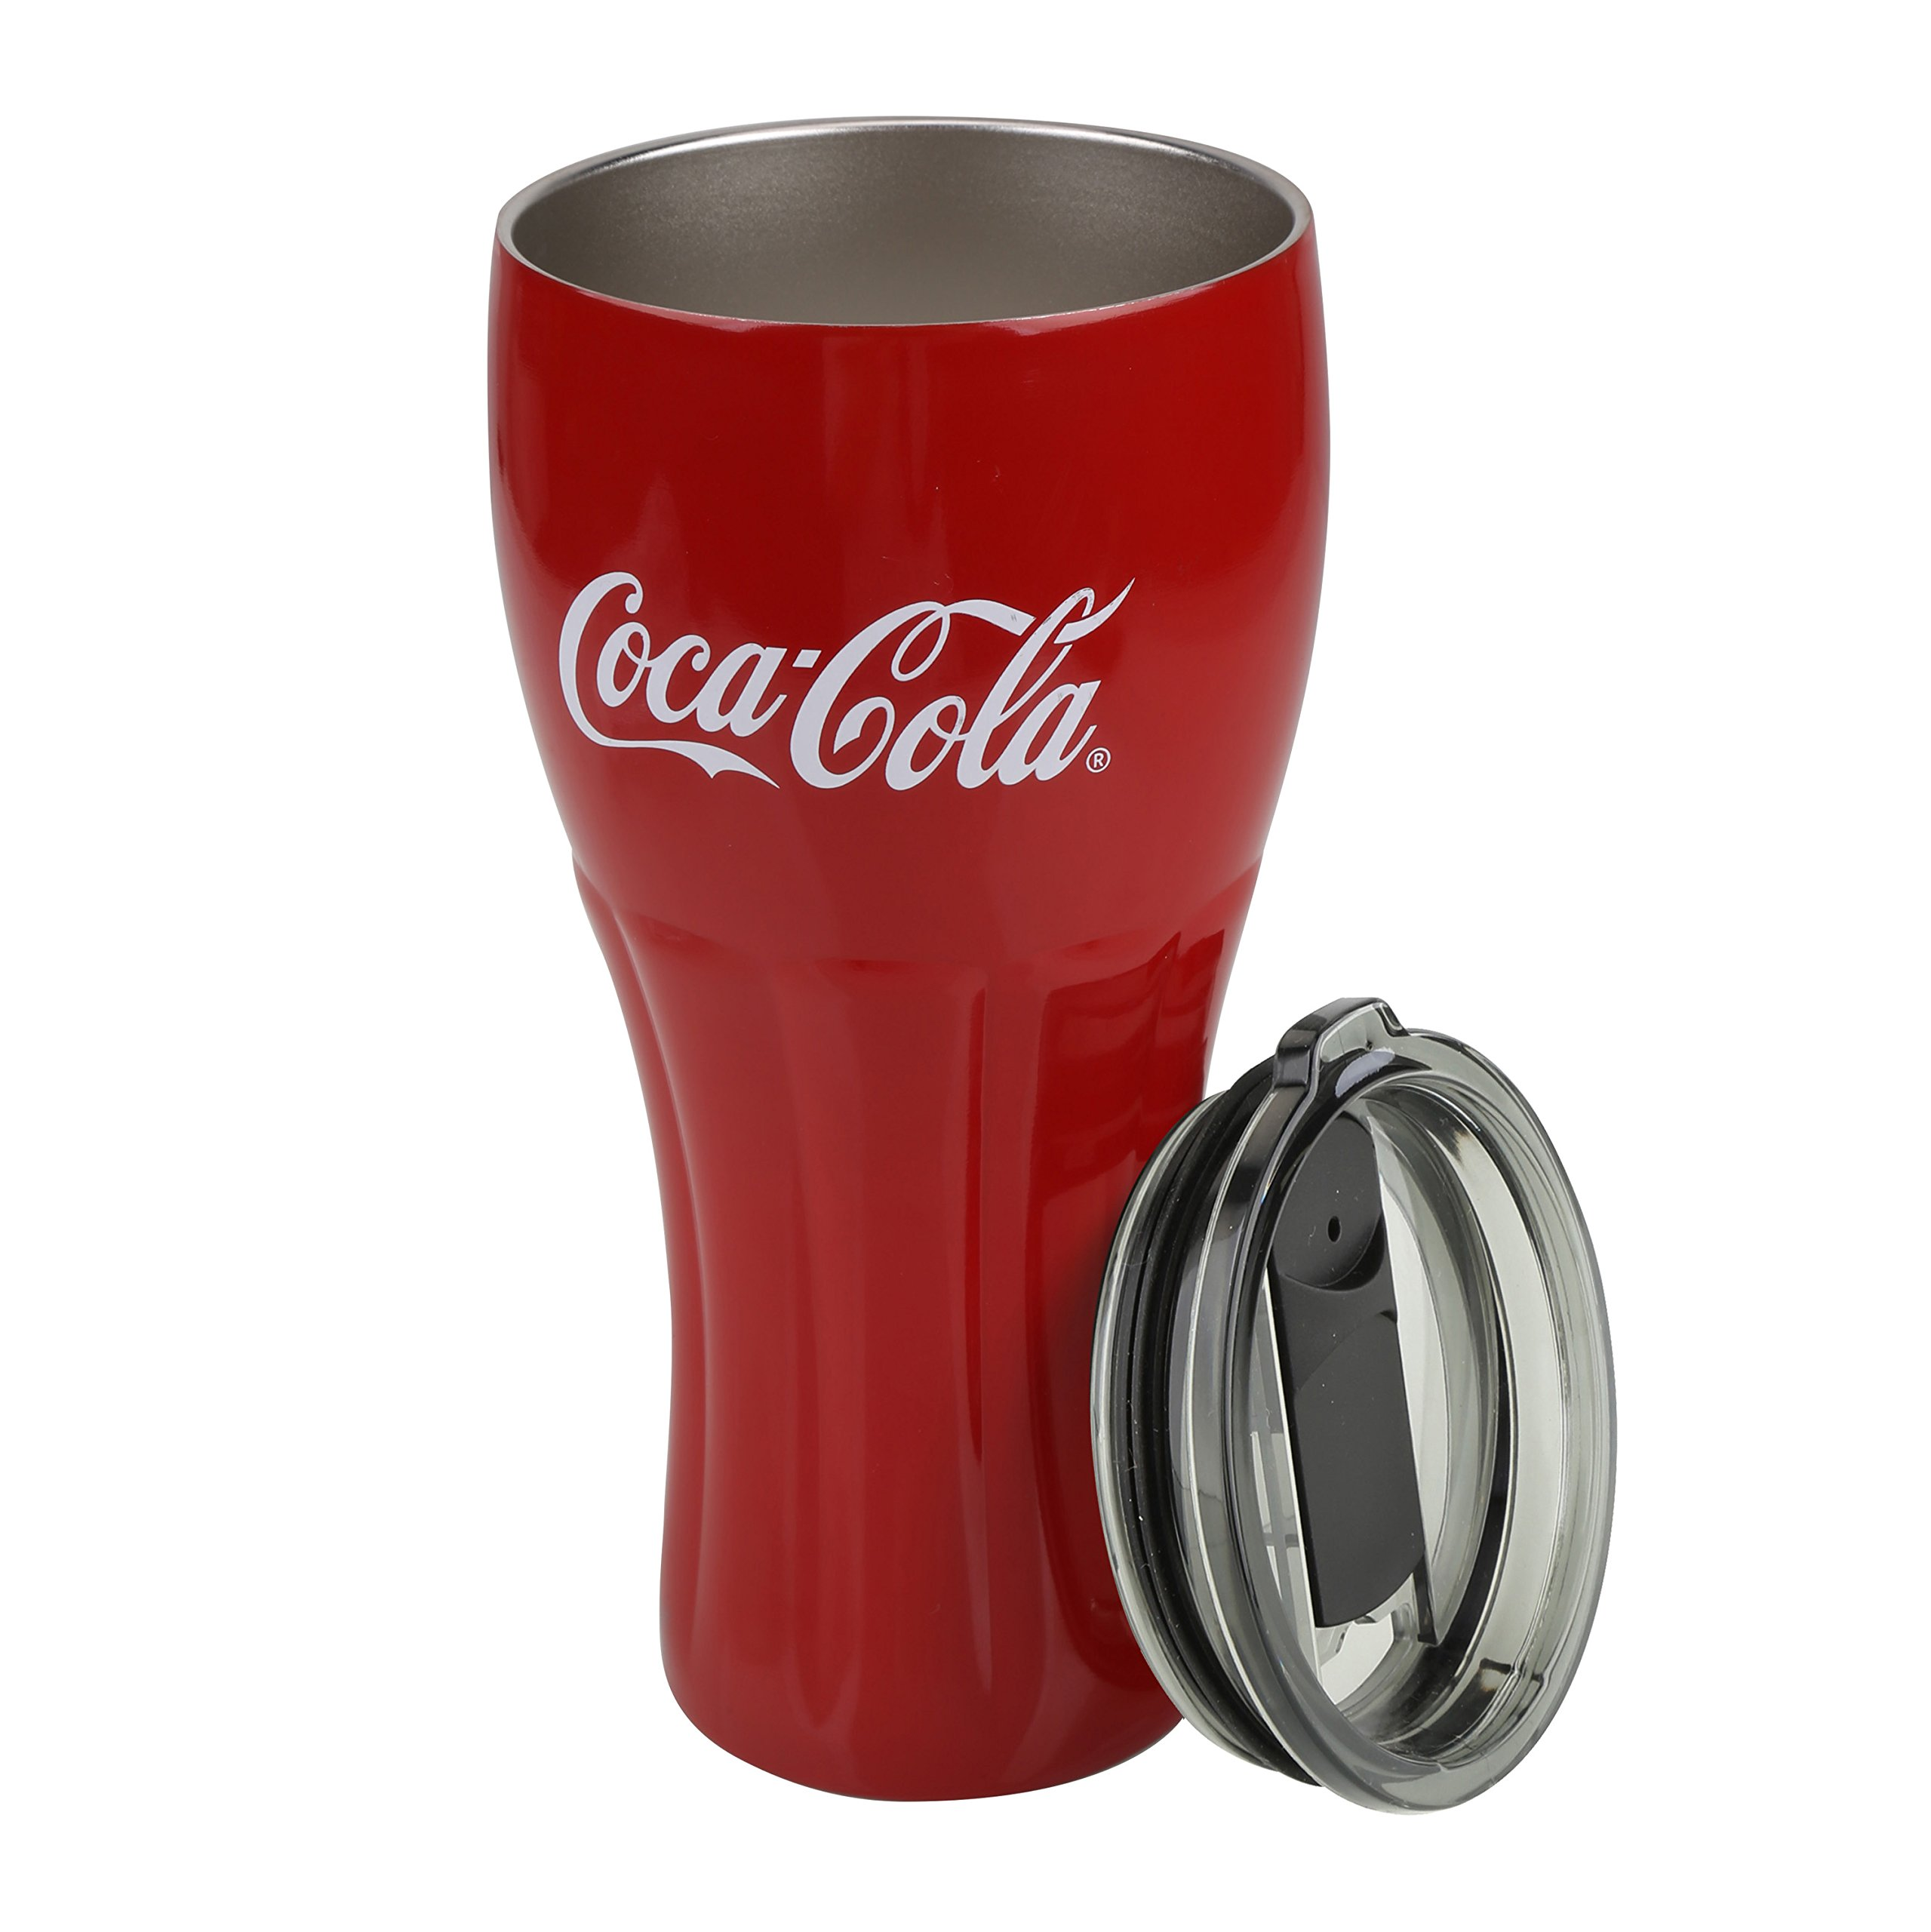 Coke Coca Cola Logo Ruby Red Plastic Tumblers Set of 6-20oz